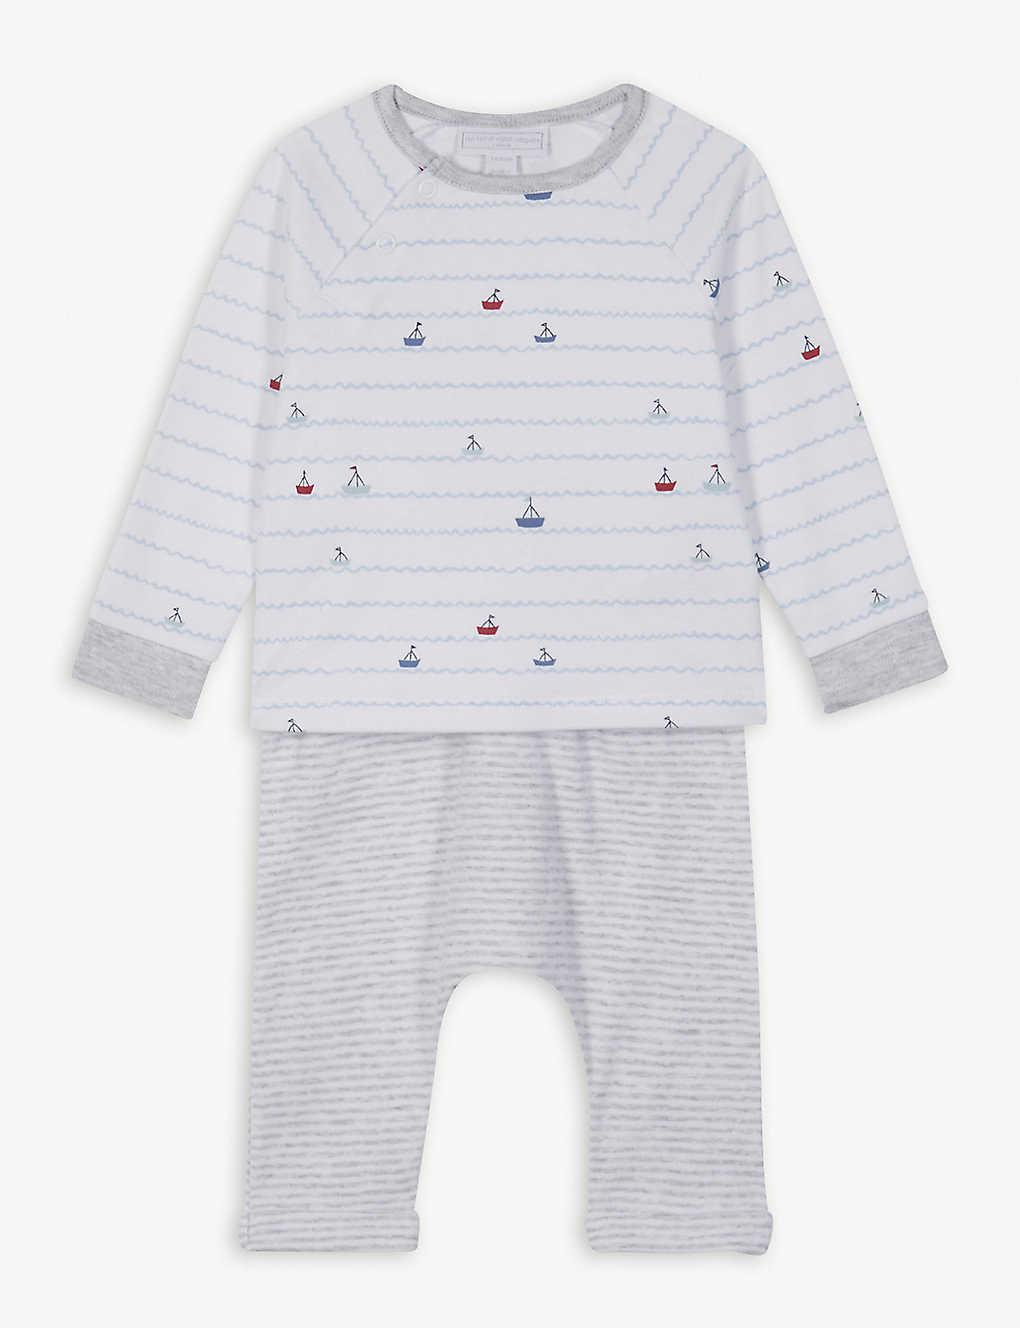 c76cd03cd49f THE LITTLE WHITE COMPANY - Striped sailboat cotton pyjamas newborn ...